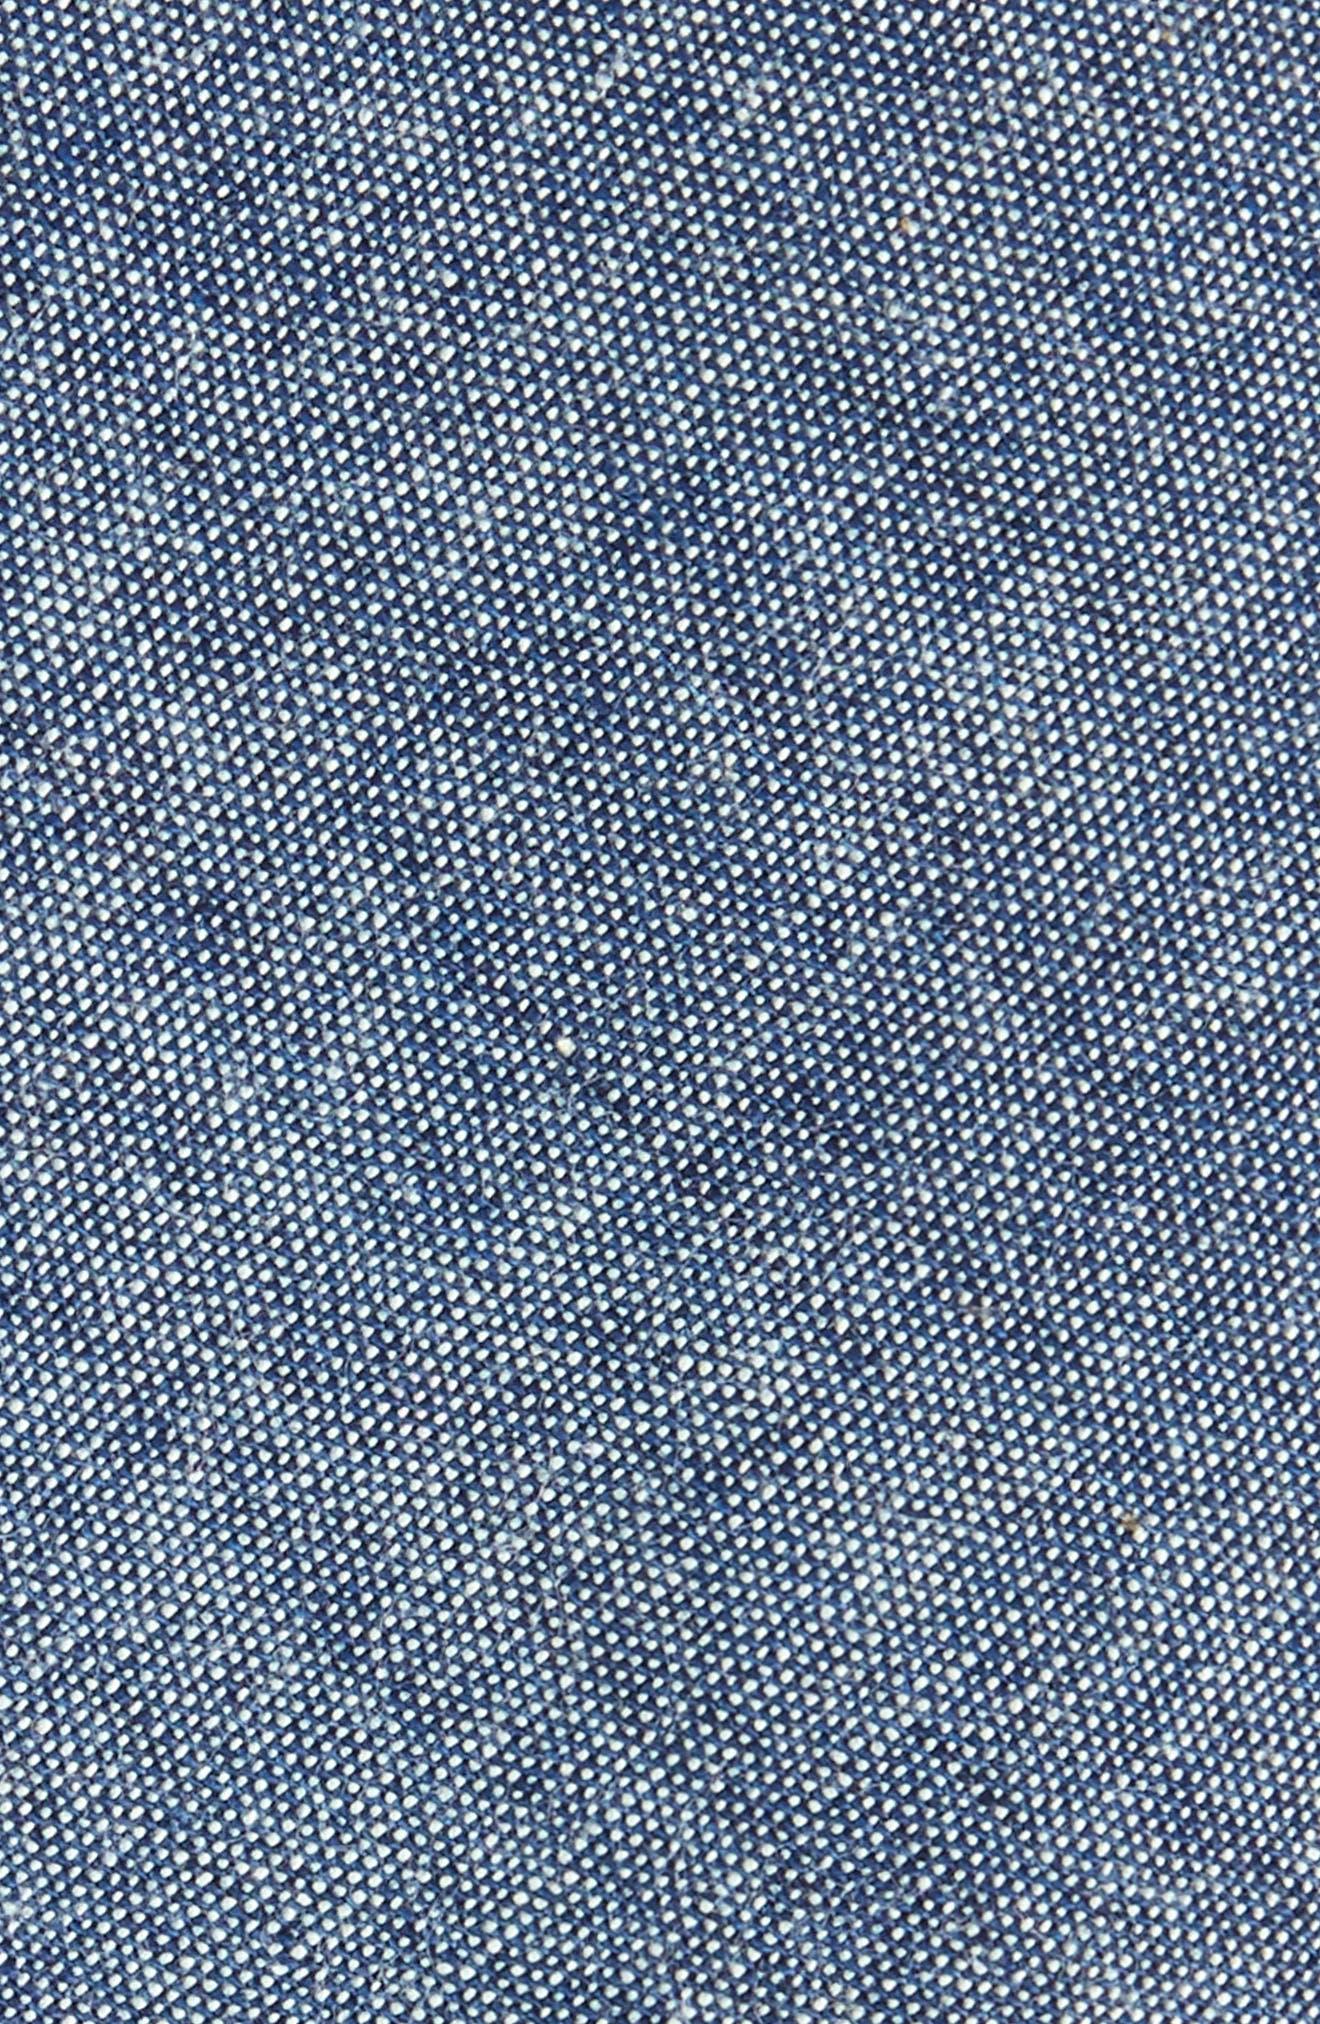 Alternate Image 2  - Eleventy Marled Cotton Skinny Tie